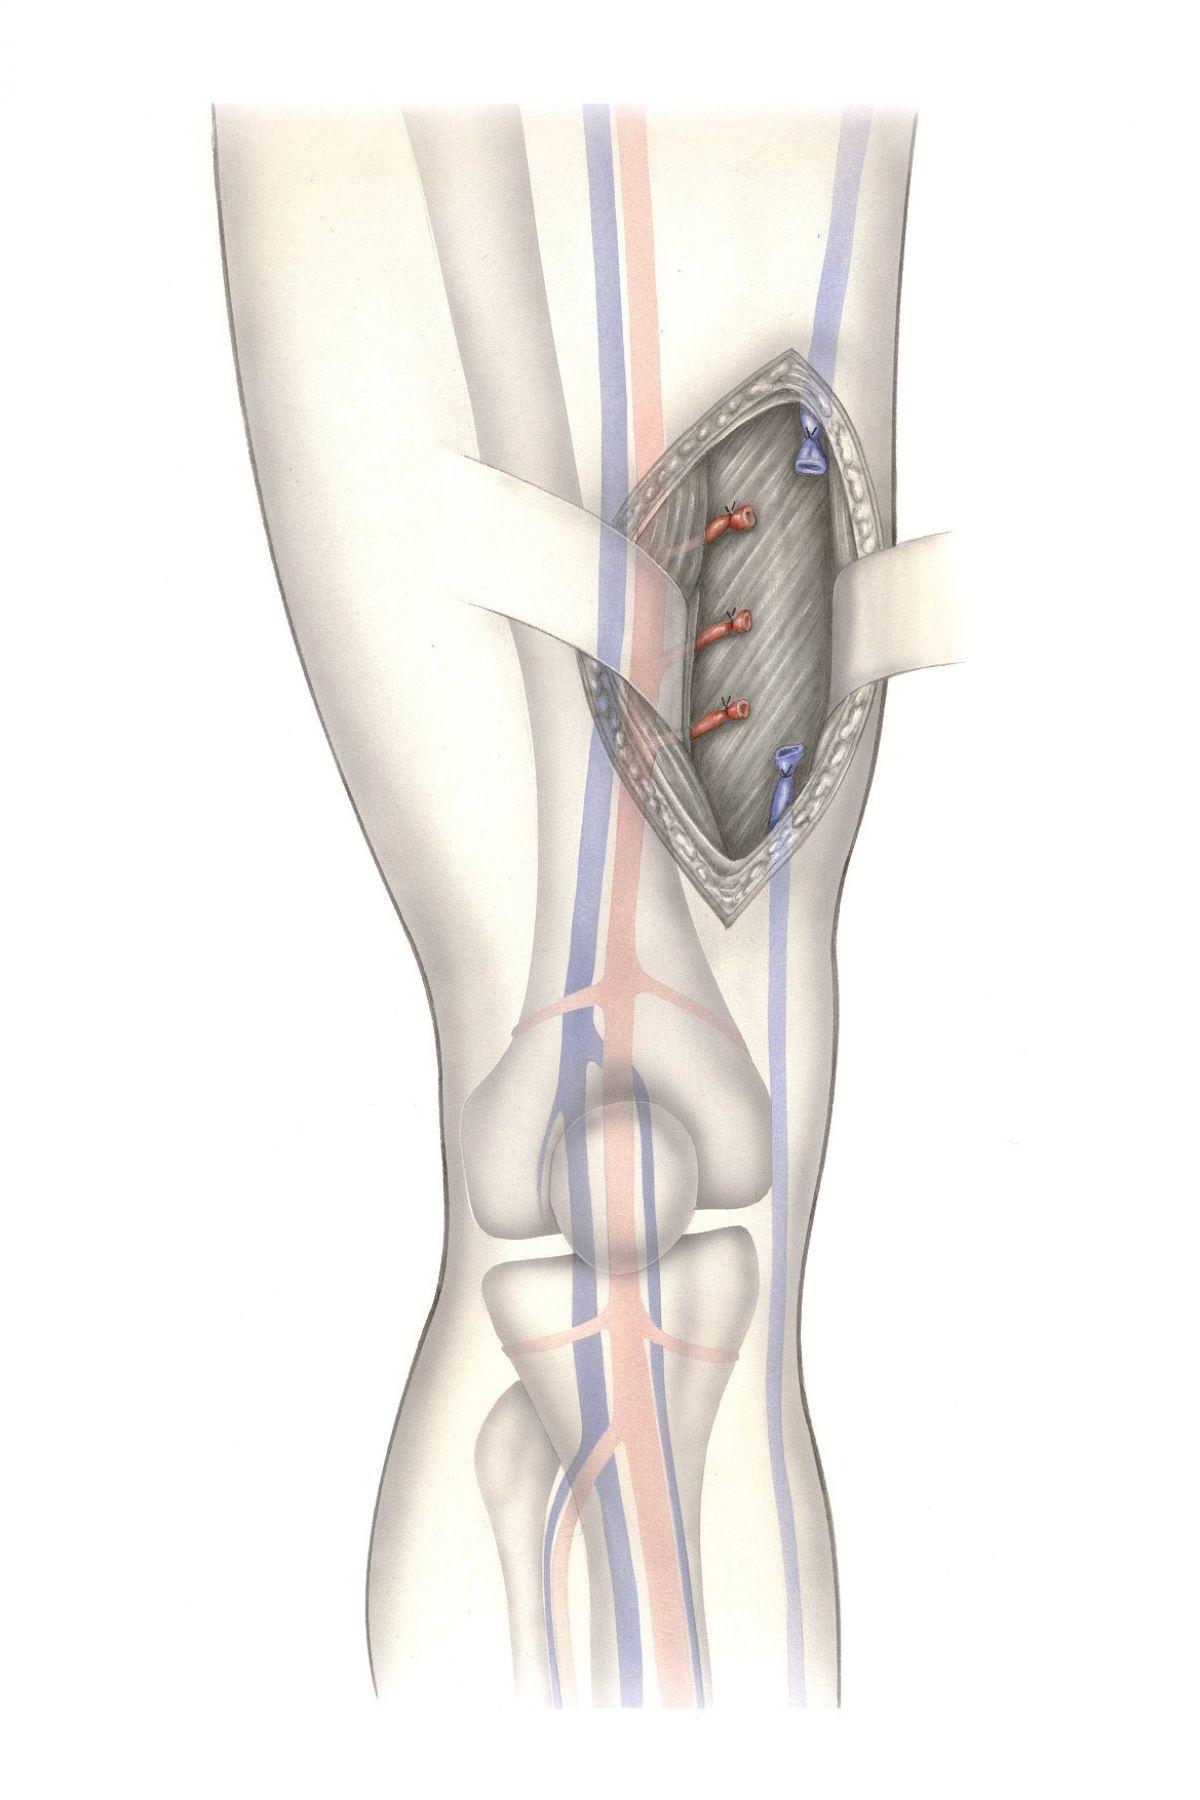 pierna con malformación vascular arterial